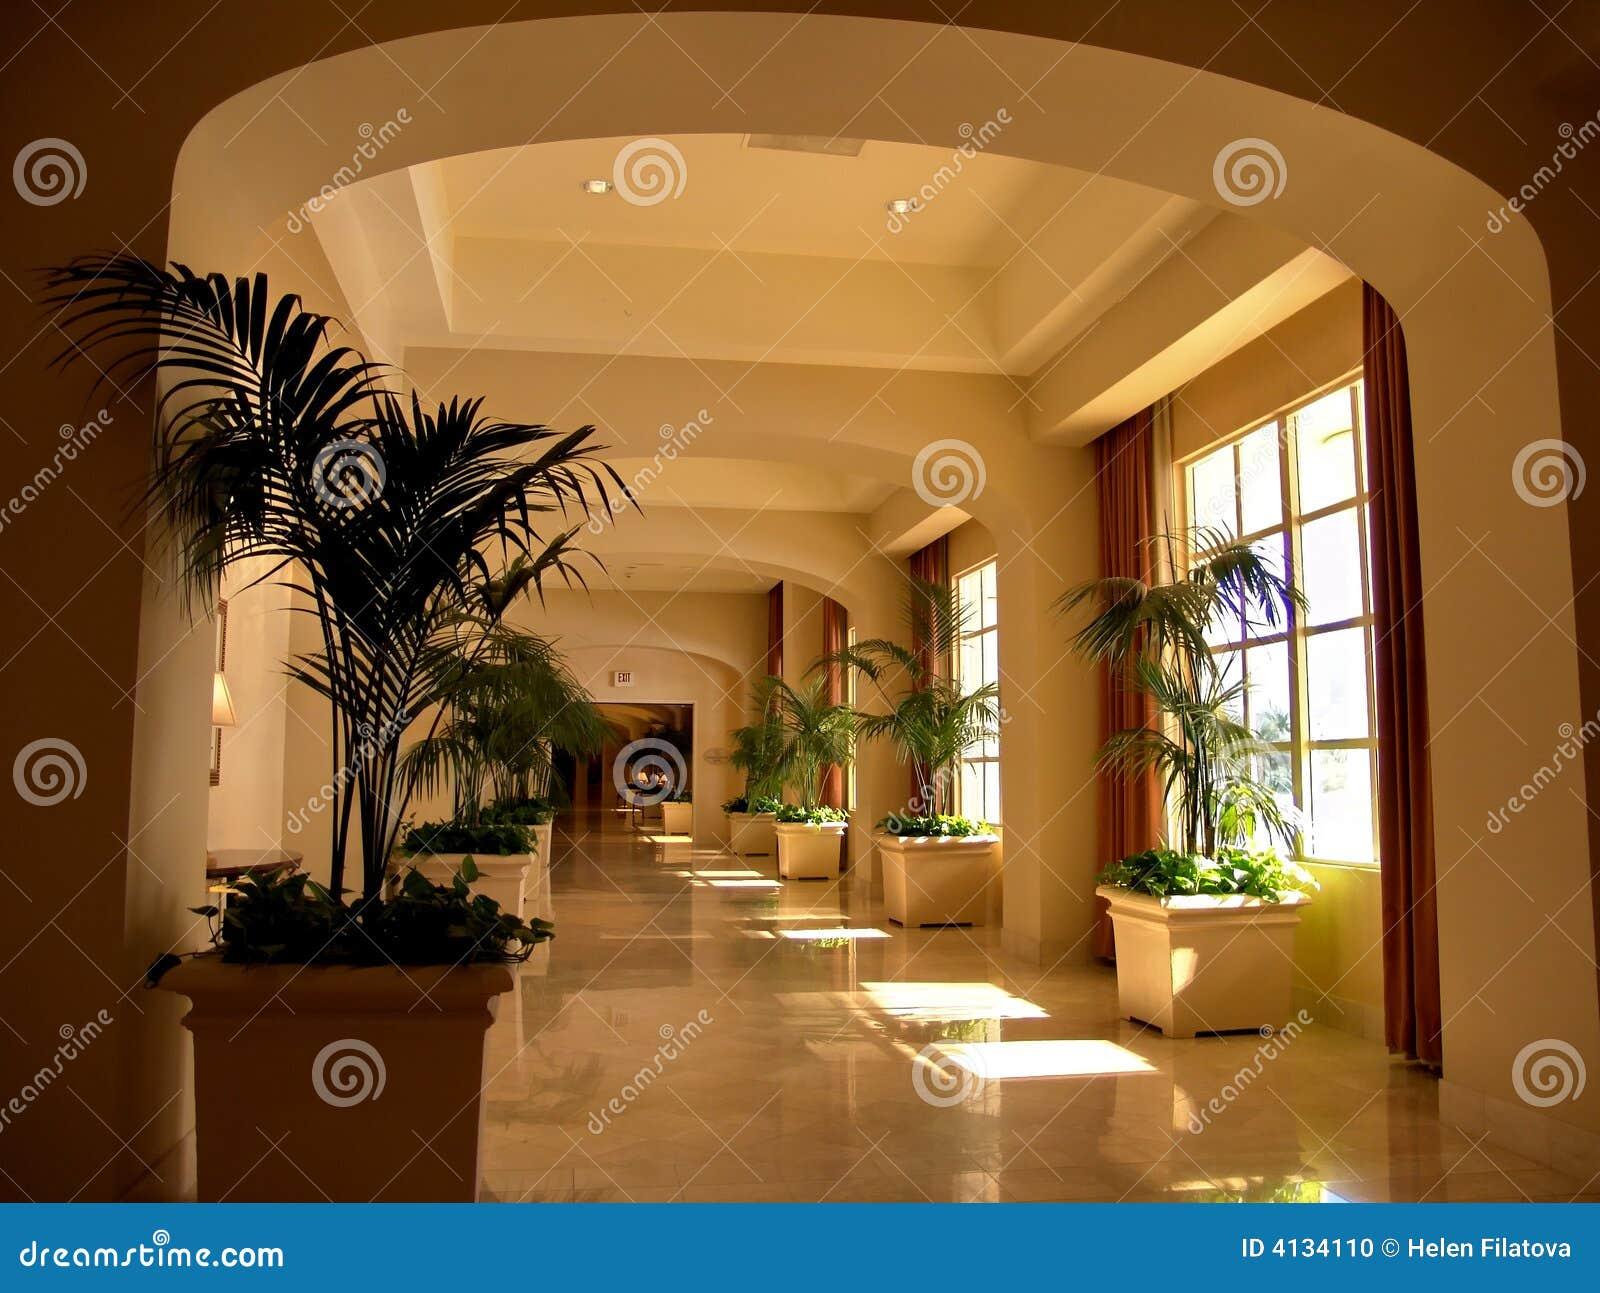 Luxury Hotel Entrance Corridor Editorial Image Image Of